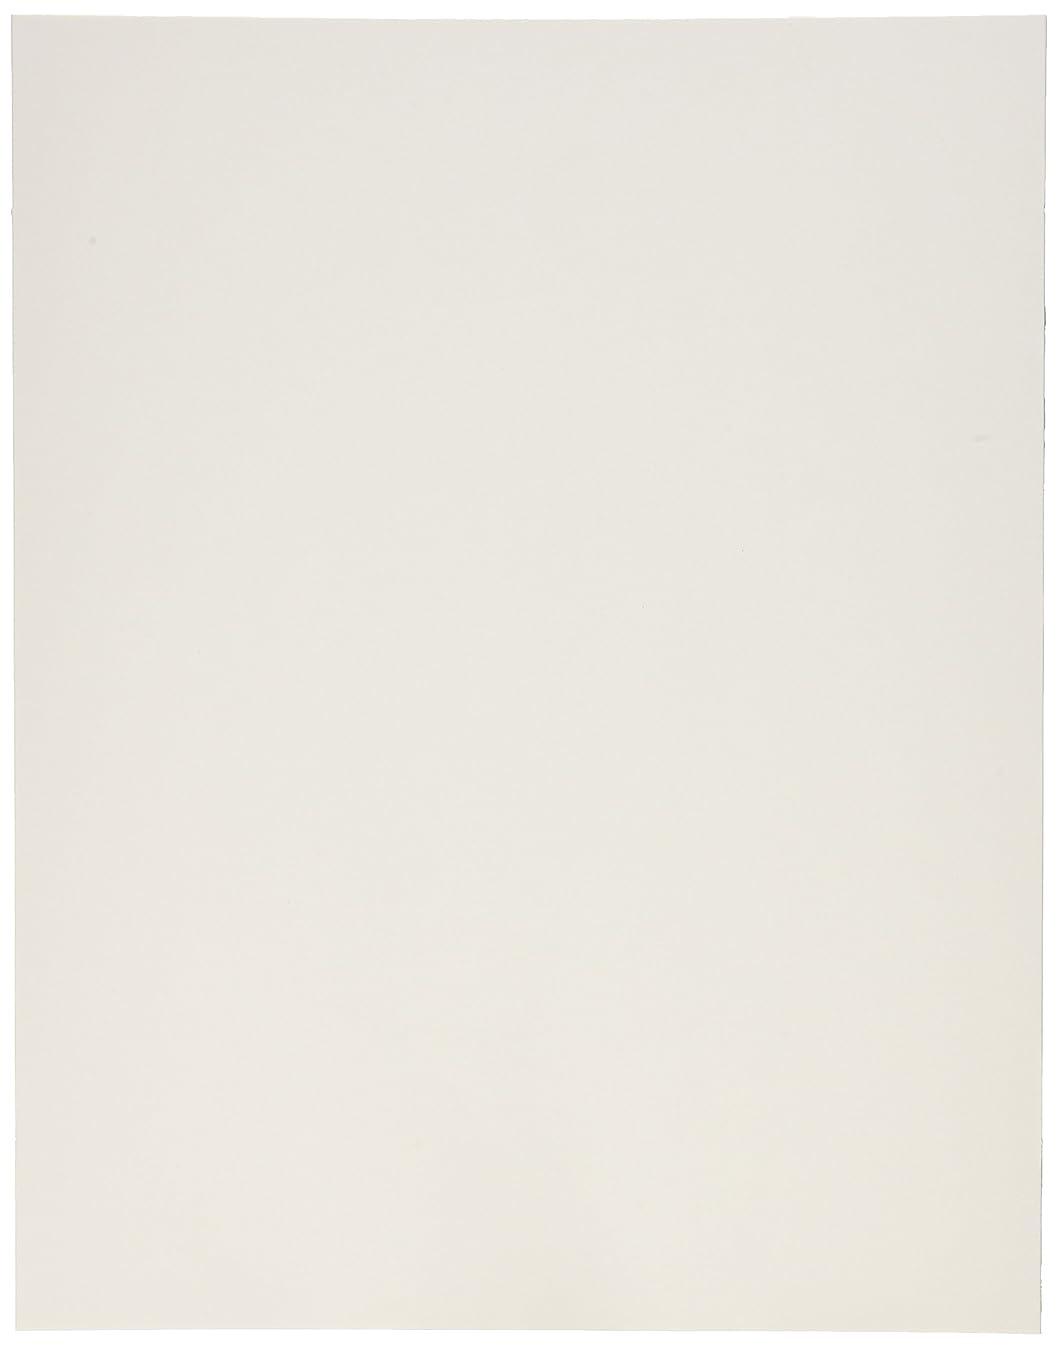 50 11x14 UNCUT mat matboard White Color b6159729340